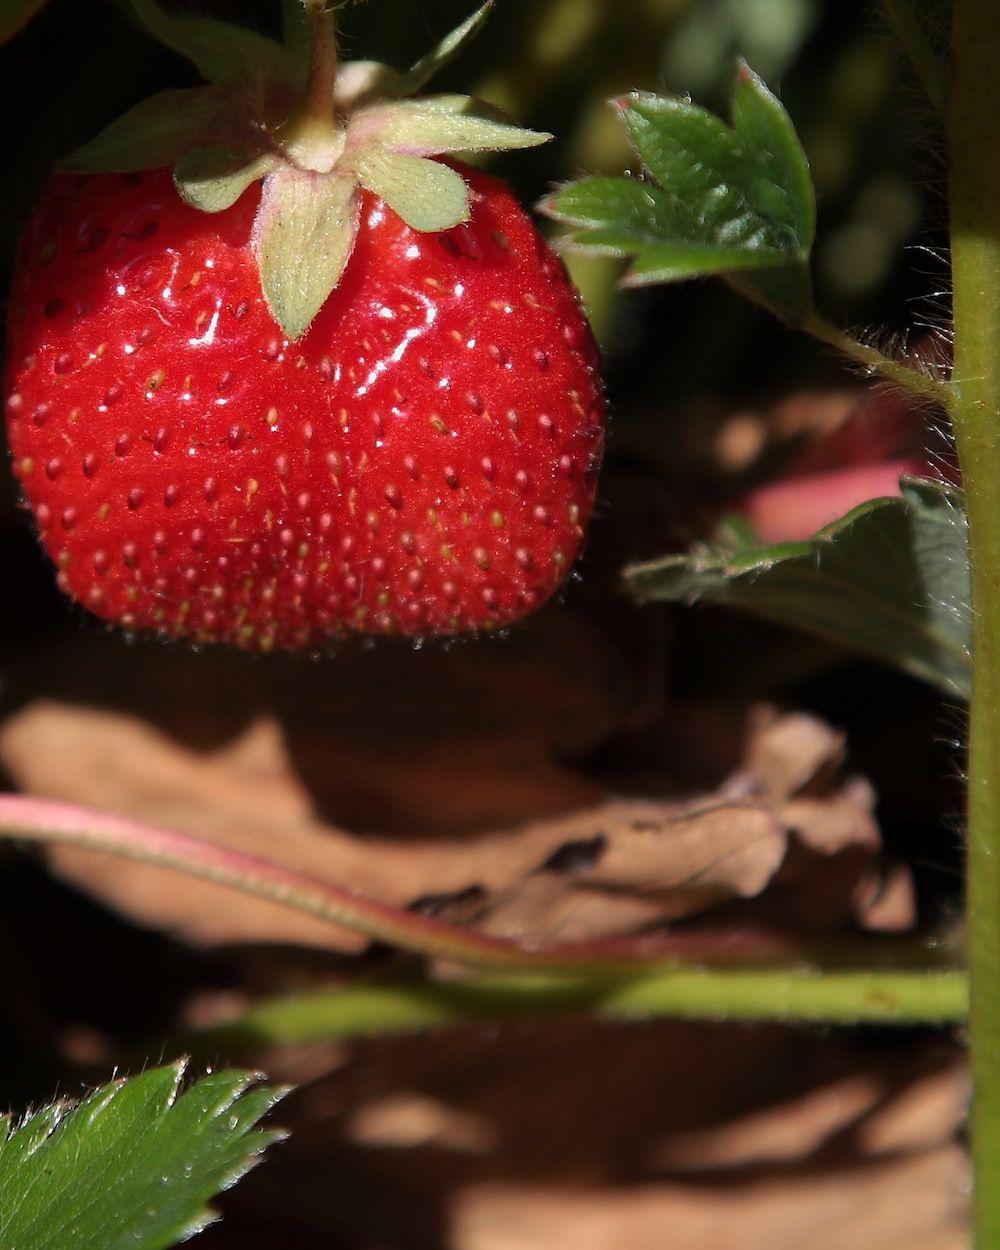 chalk-hill-strawberry